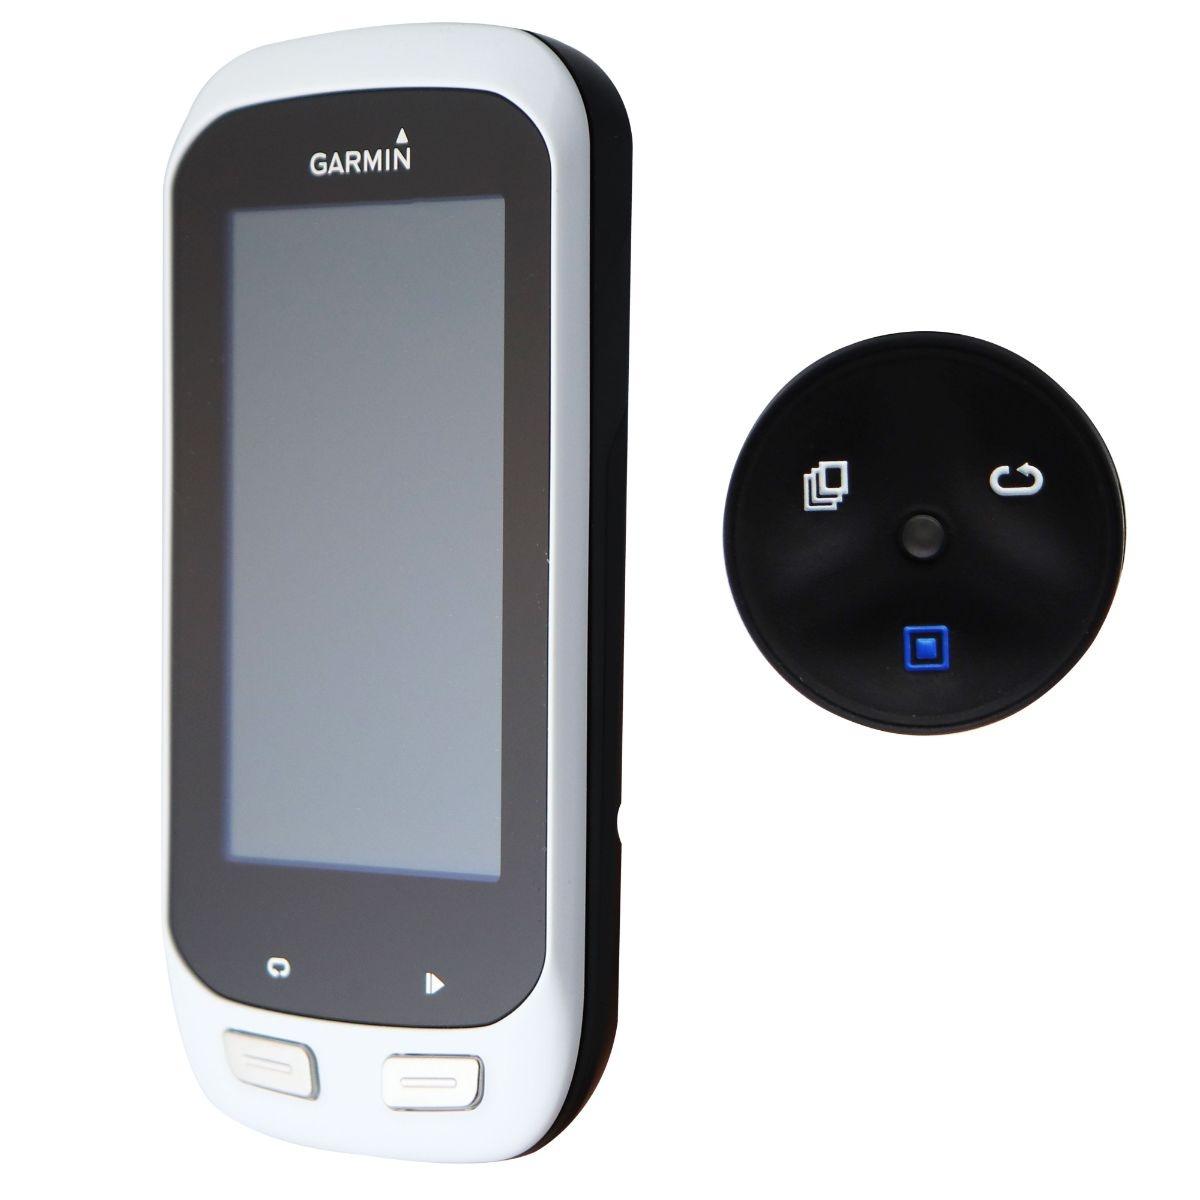 Garmin Edge Explore 1000 GPS Device with Bike Route Integration - 010-01527-00